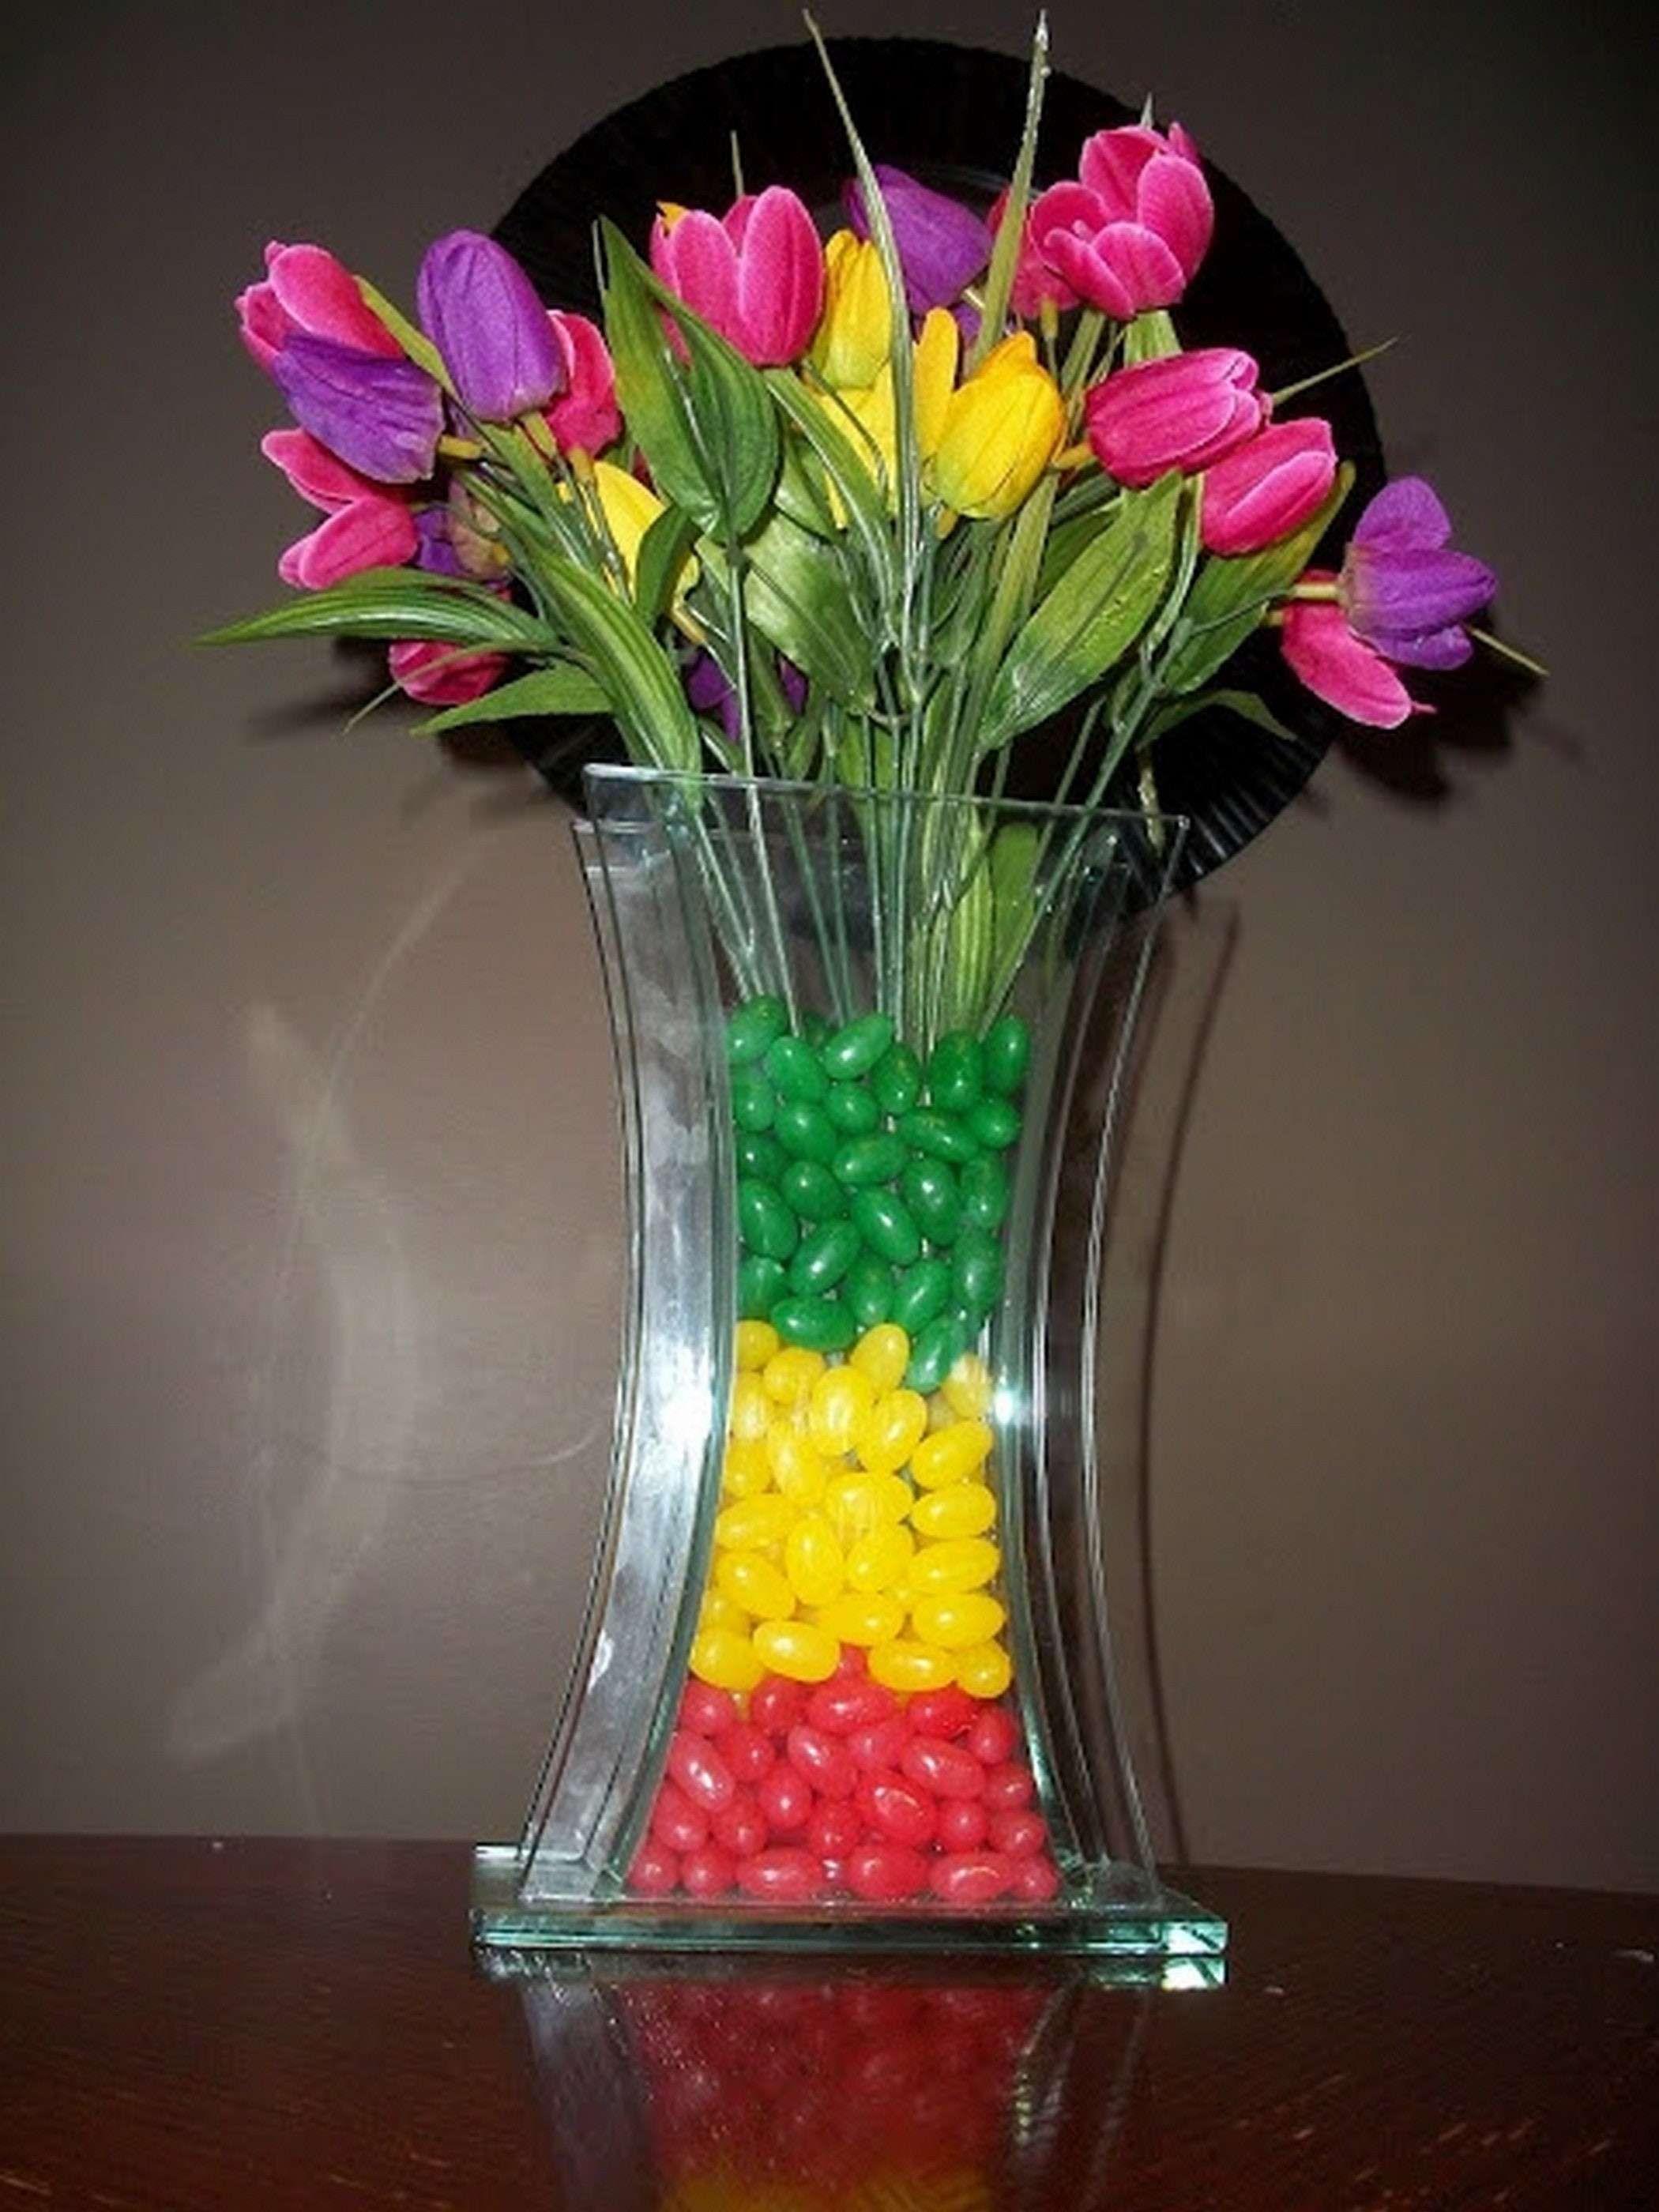 cut out vase of green glass vase elegant 15 cheap and easy diy vase filler ideas 3h inside green glass vase elegant 15 cheap and easy diy vase filler ideas 3h vases flower i